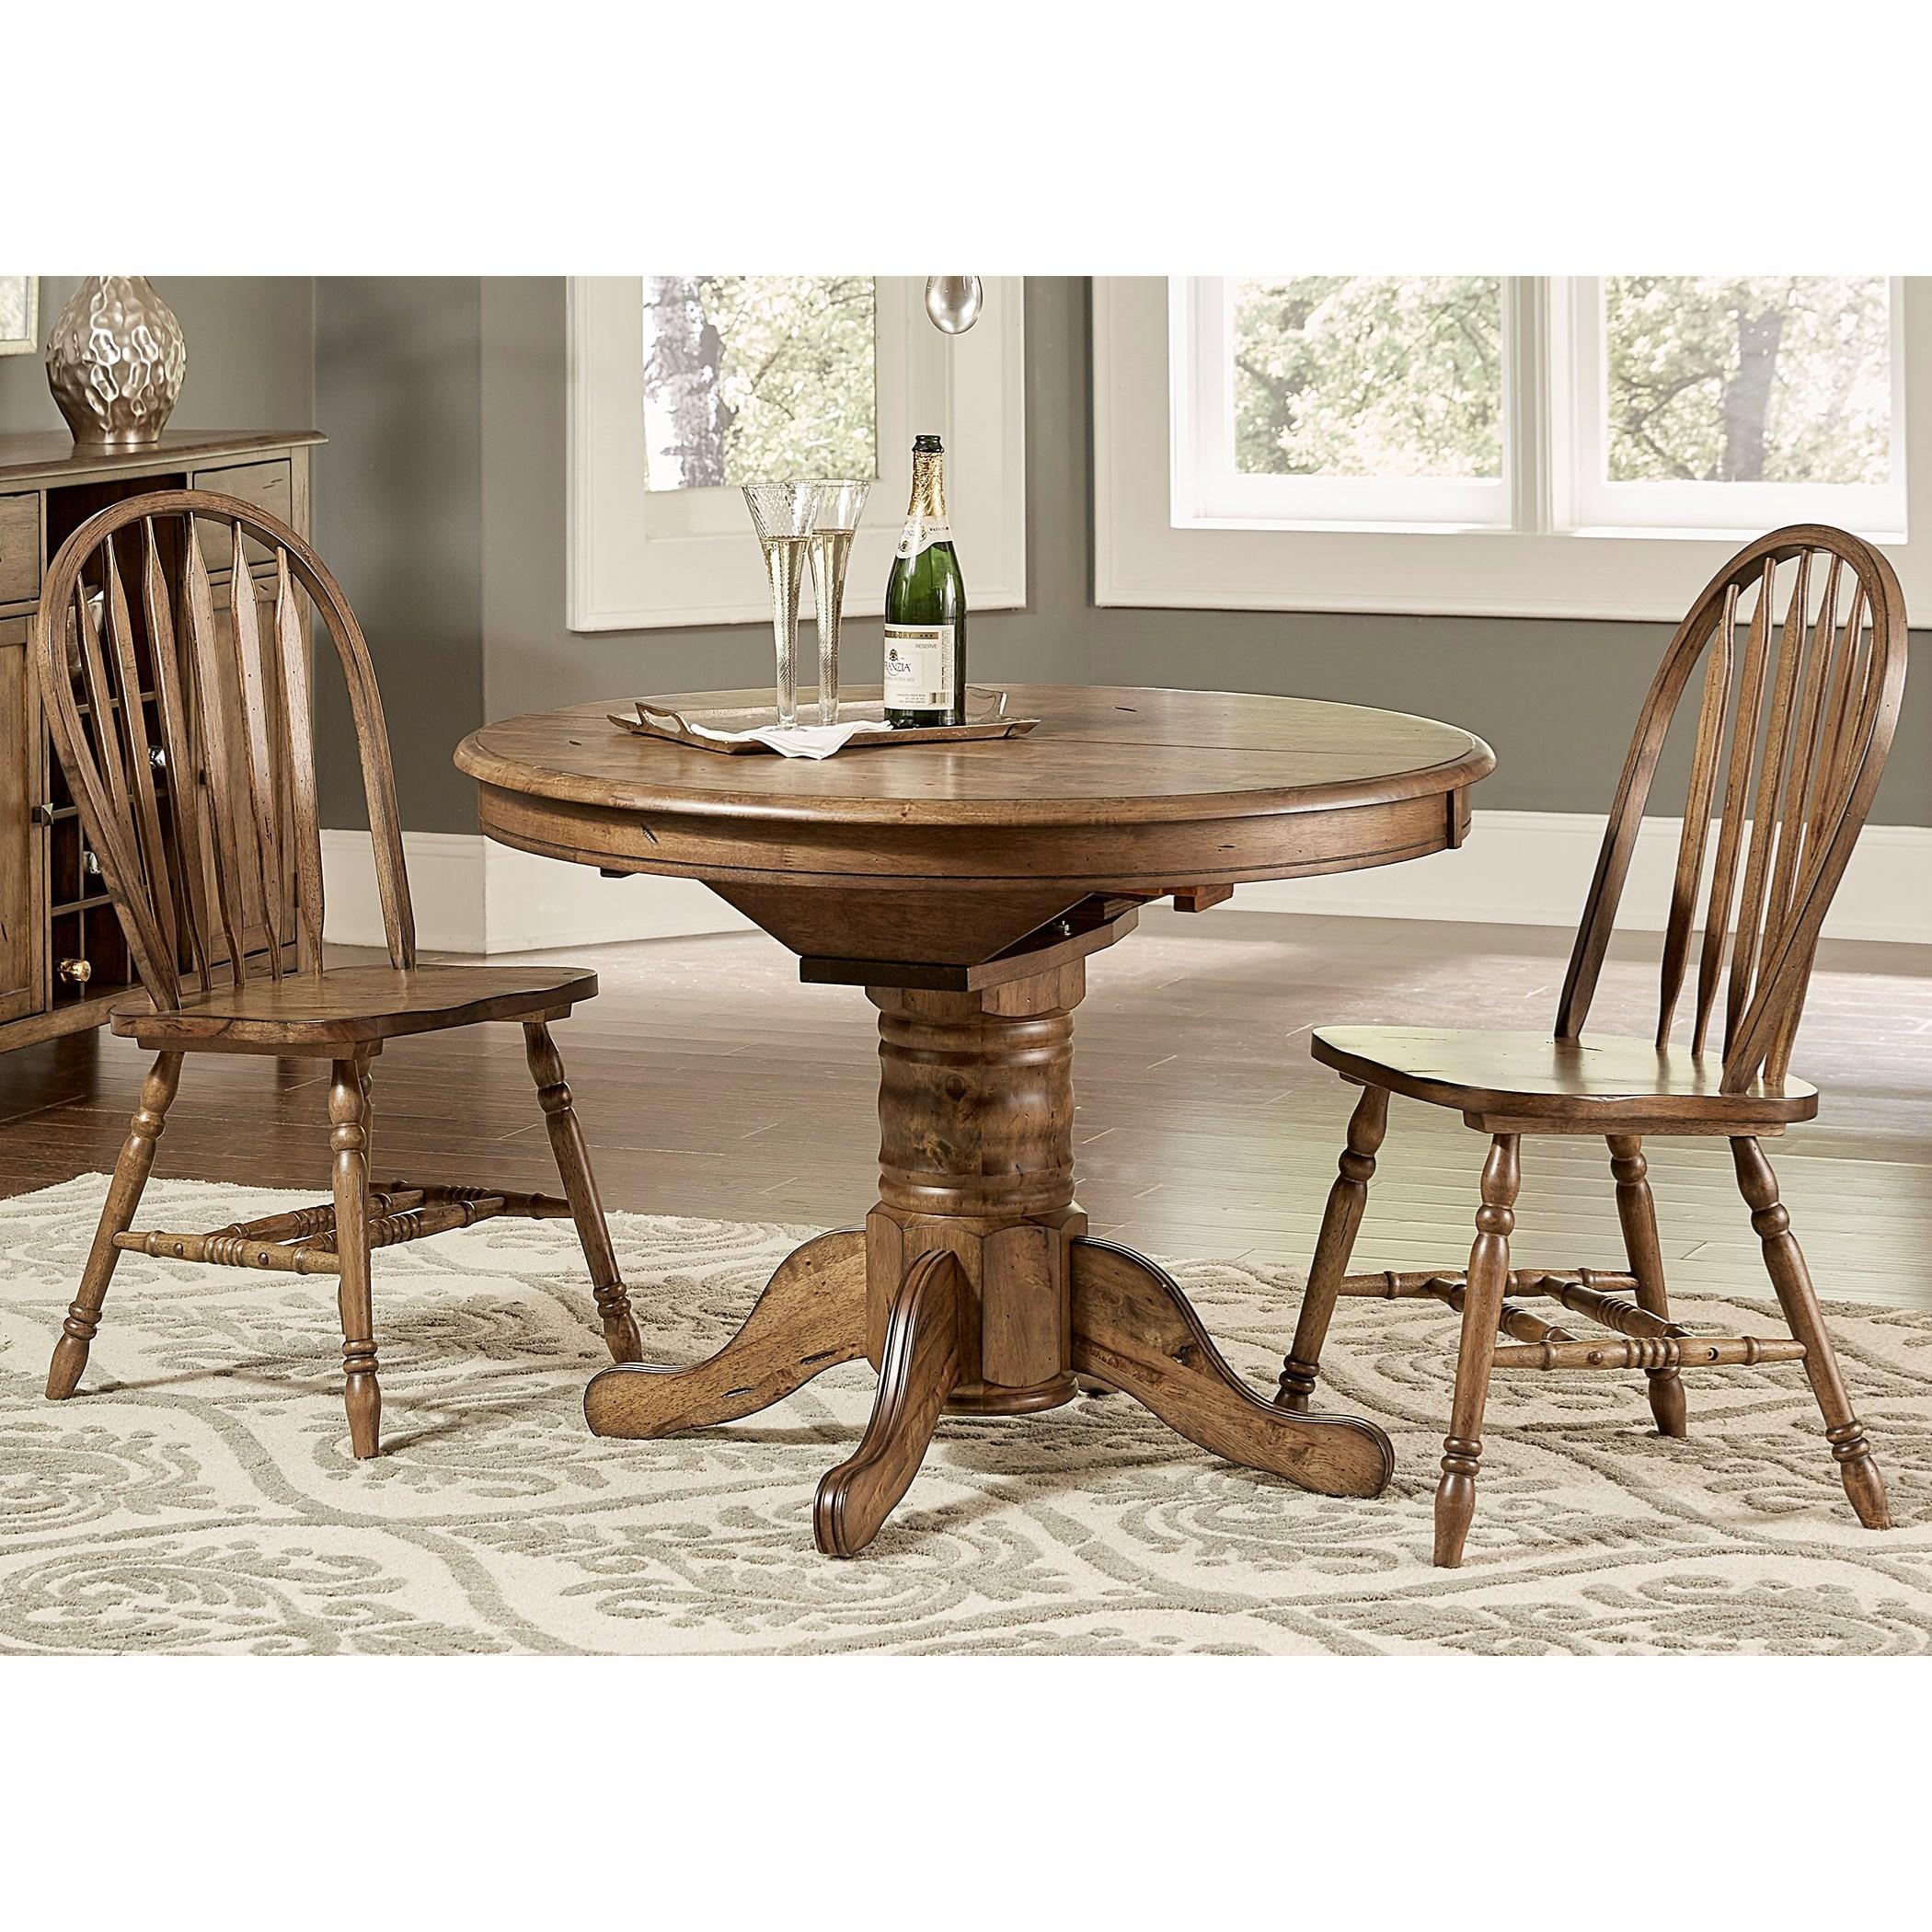 Liberty Furniture Springfield 7 Piece Pedestal Table Set: Liberty Furniture Carolina Crossing Pedestal Table And